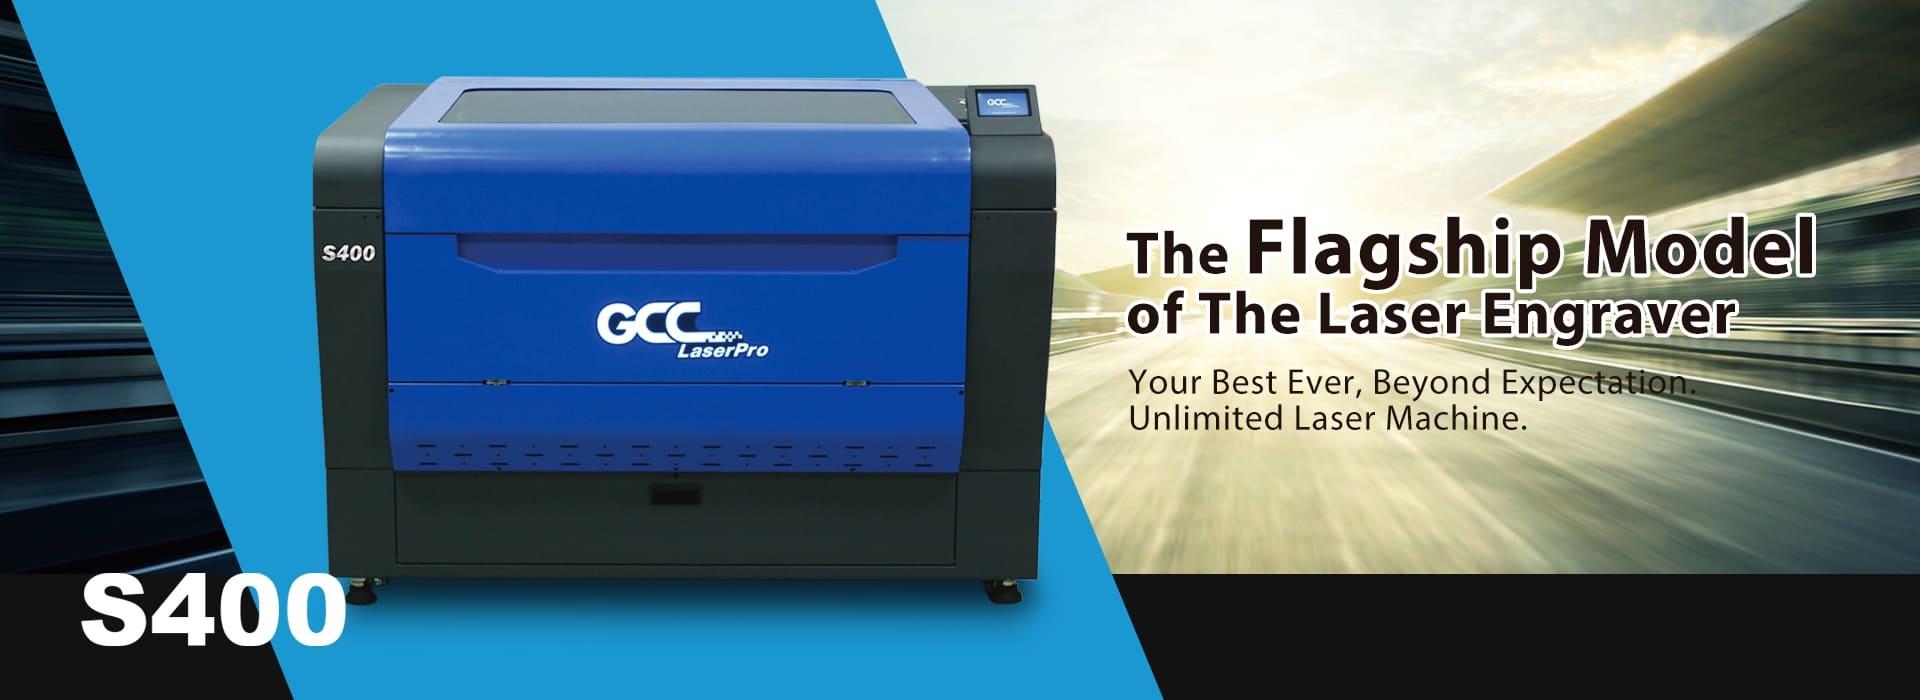 GCC S400 提供無限可能,效果超出預期